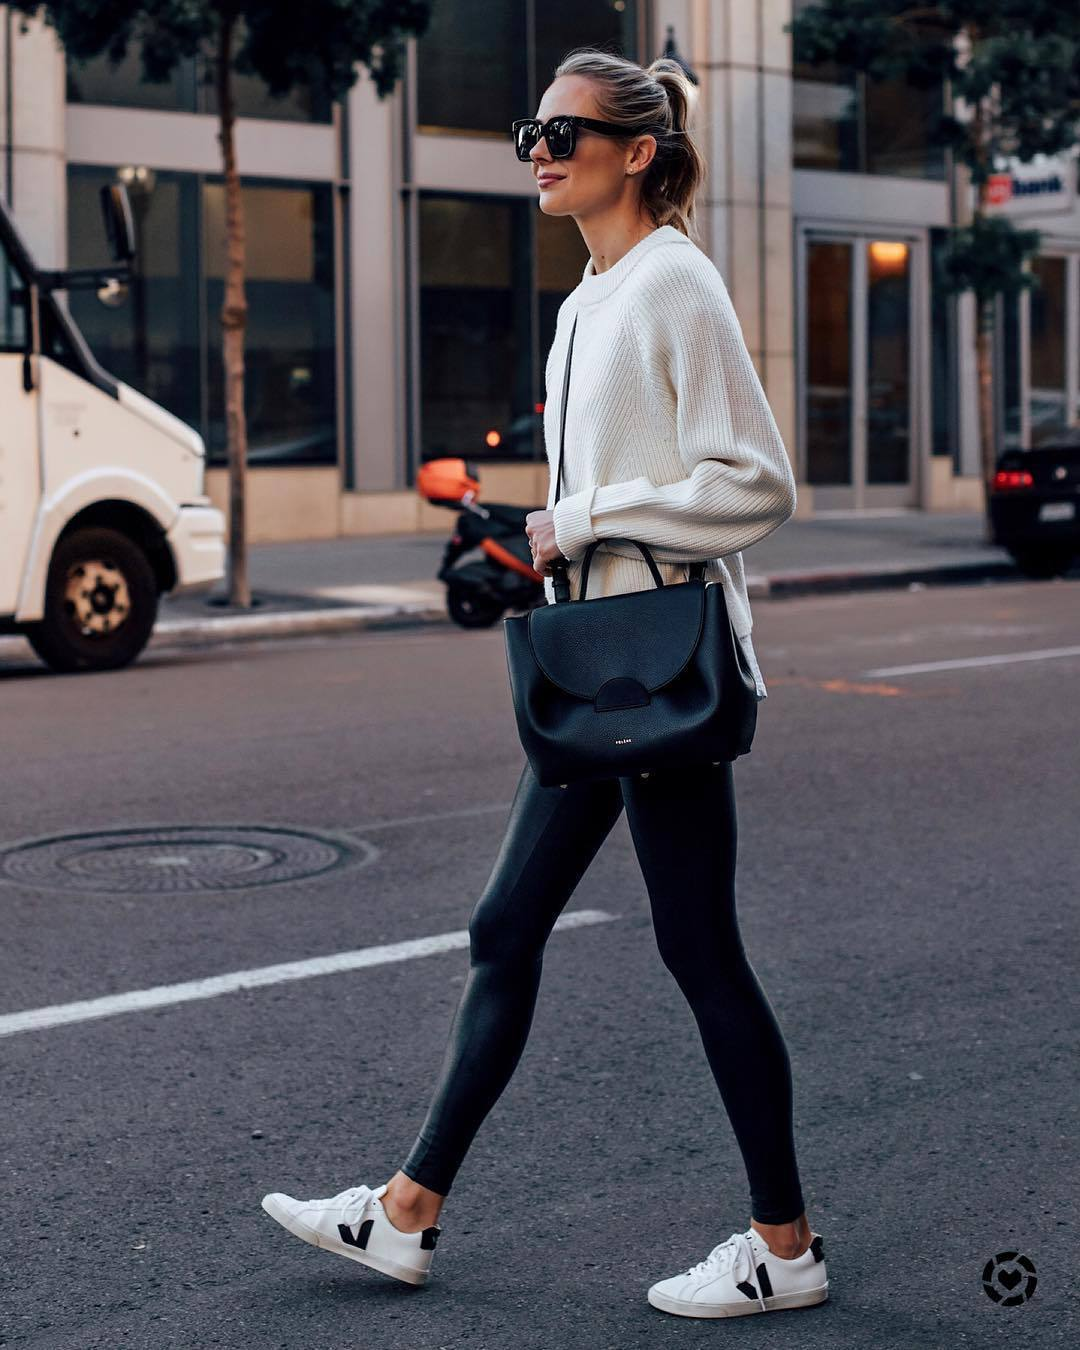 pants black leggings white sneakers black bag crossbody bag white sweater knitted sweater black sunglasses streetstyle